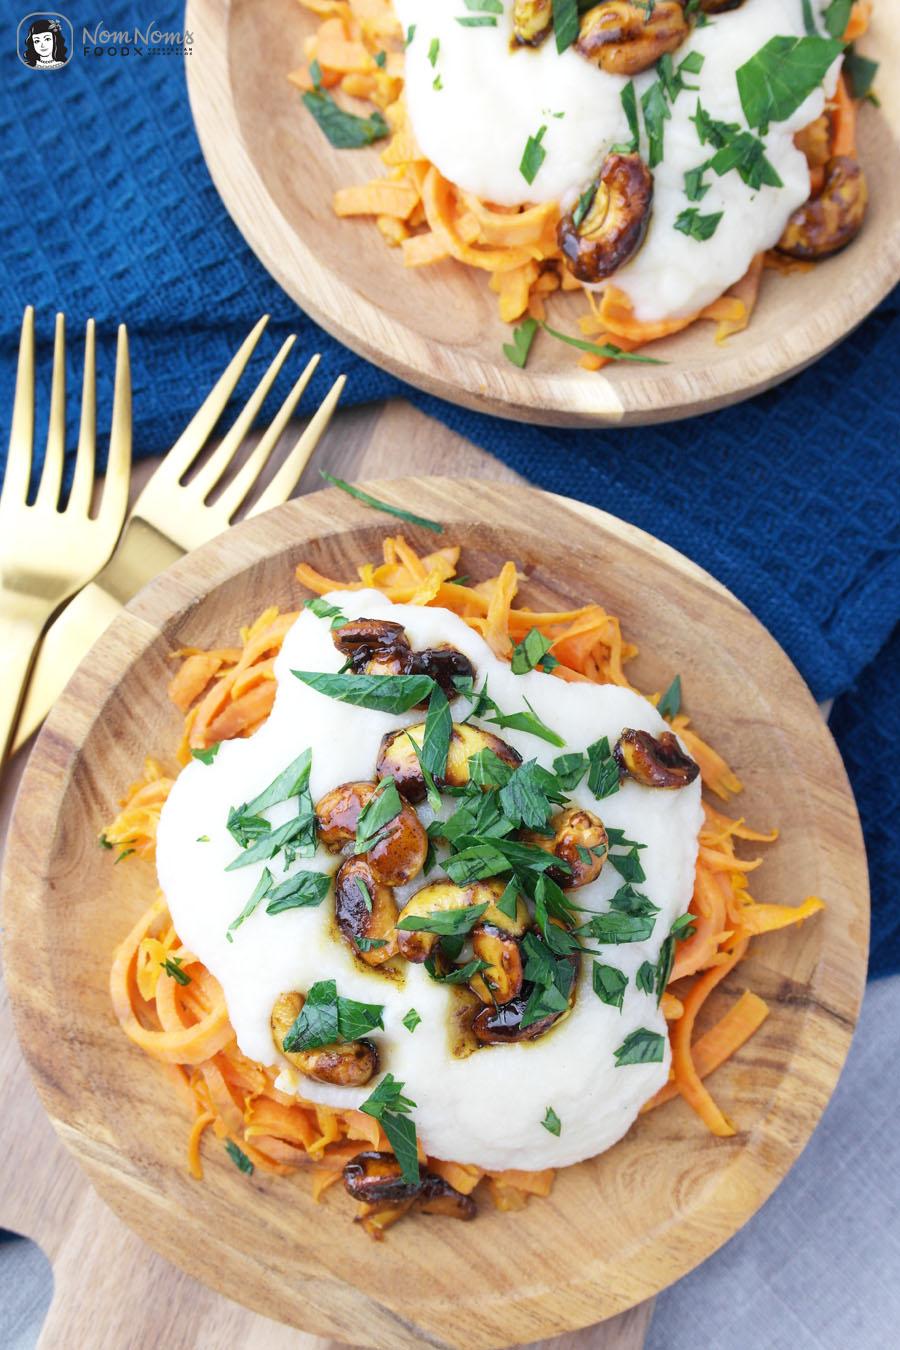 Süßkartoffel-Spaghetti mit Blumenkohl-Käse-Sauce und karamellisierten Curry-Cashews